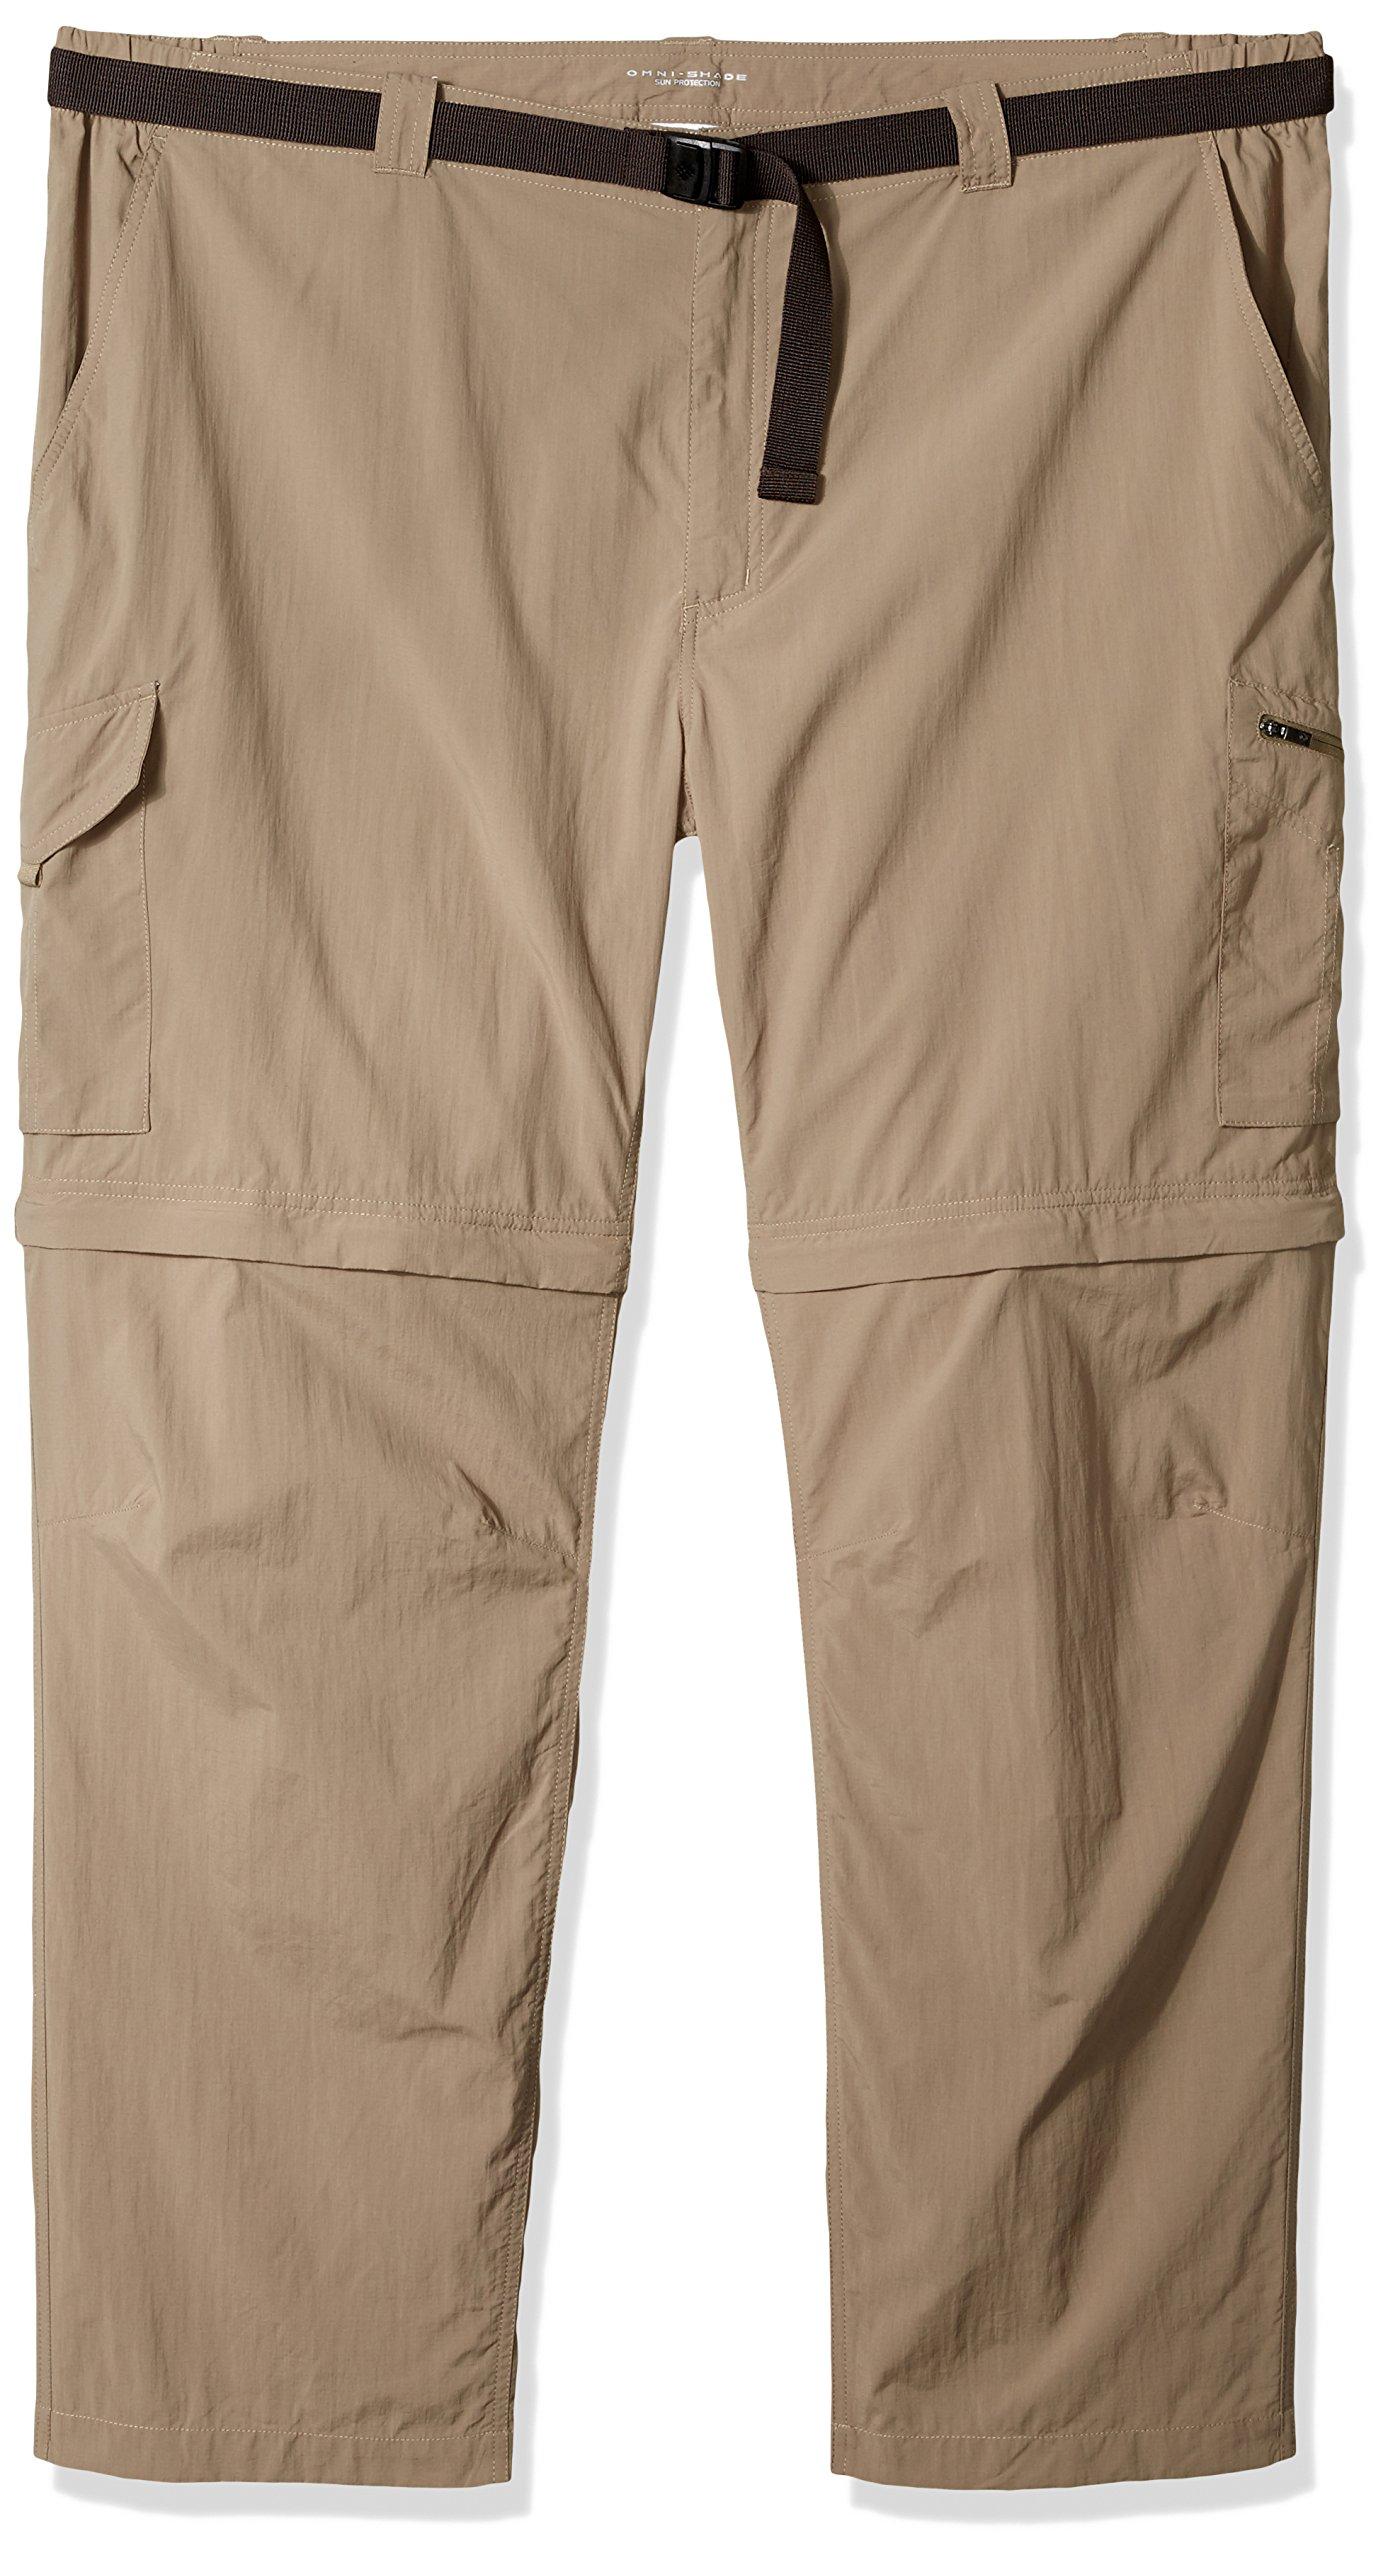 Columbia Men's Silver Ridge Big & Tall Convertible Pants, Sage, 42 x 34 by Columbia